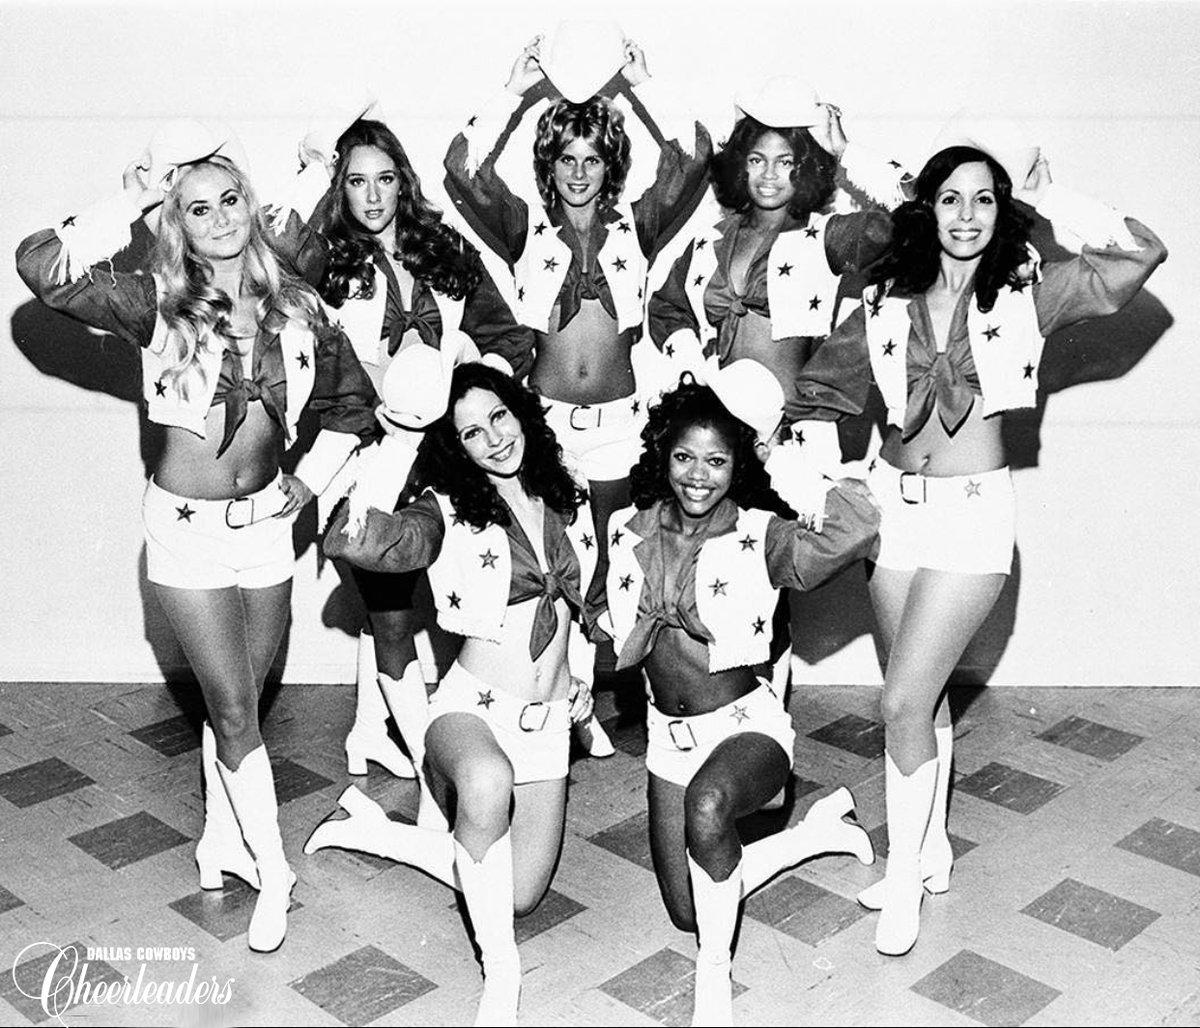 Did you know that the iconic #DCCheerleaders uniform was designed by Paula Van Wagoner in 1️⃣9️⃣7️⃣2️⃣? #TBT